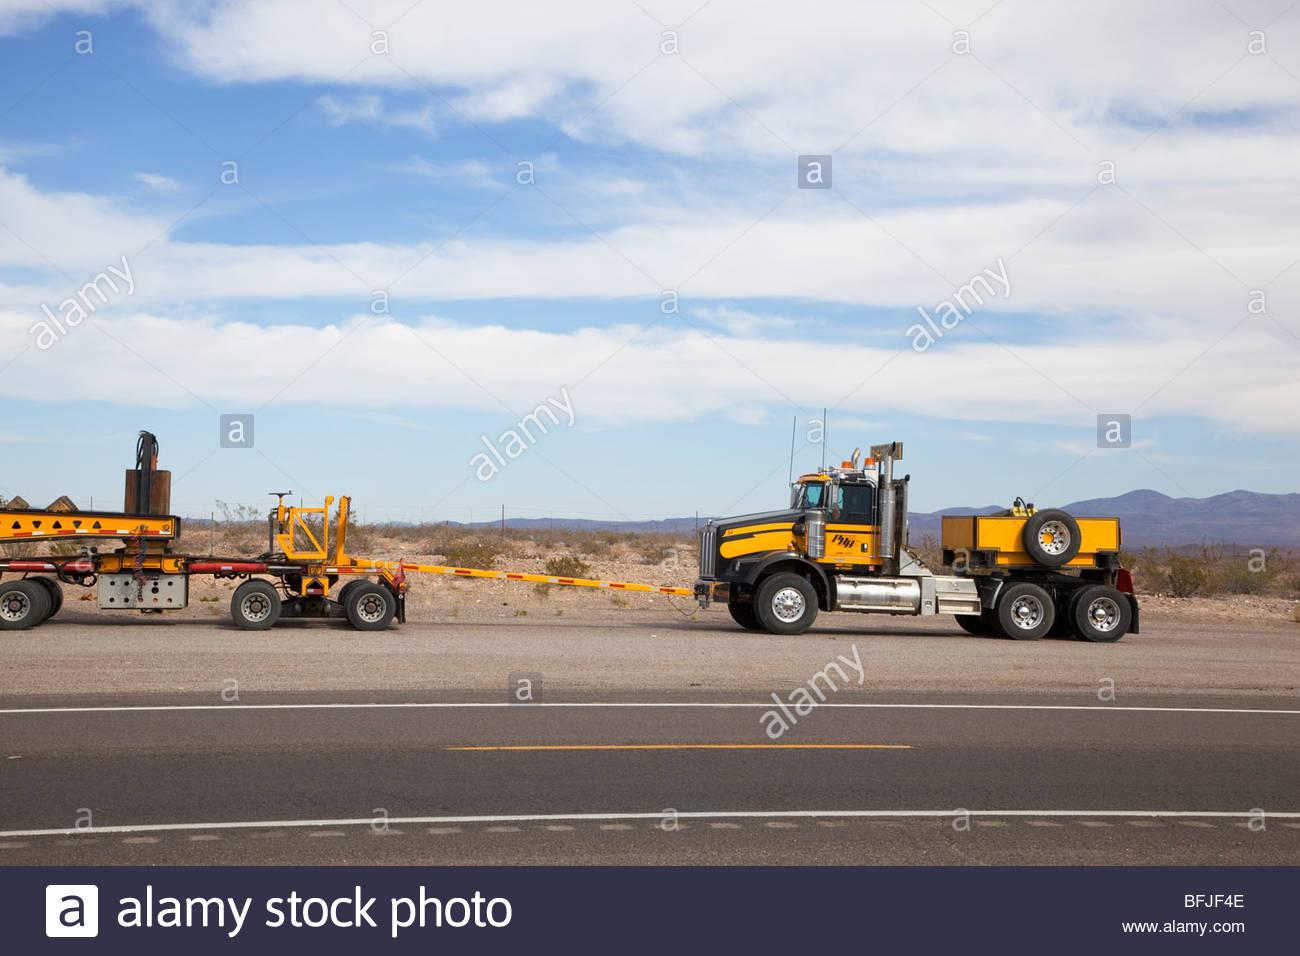 Heavy hauling oversize load detail tractor pushing parked Arizona - Stock Image